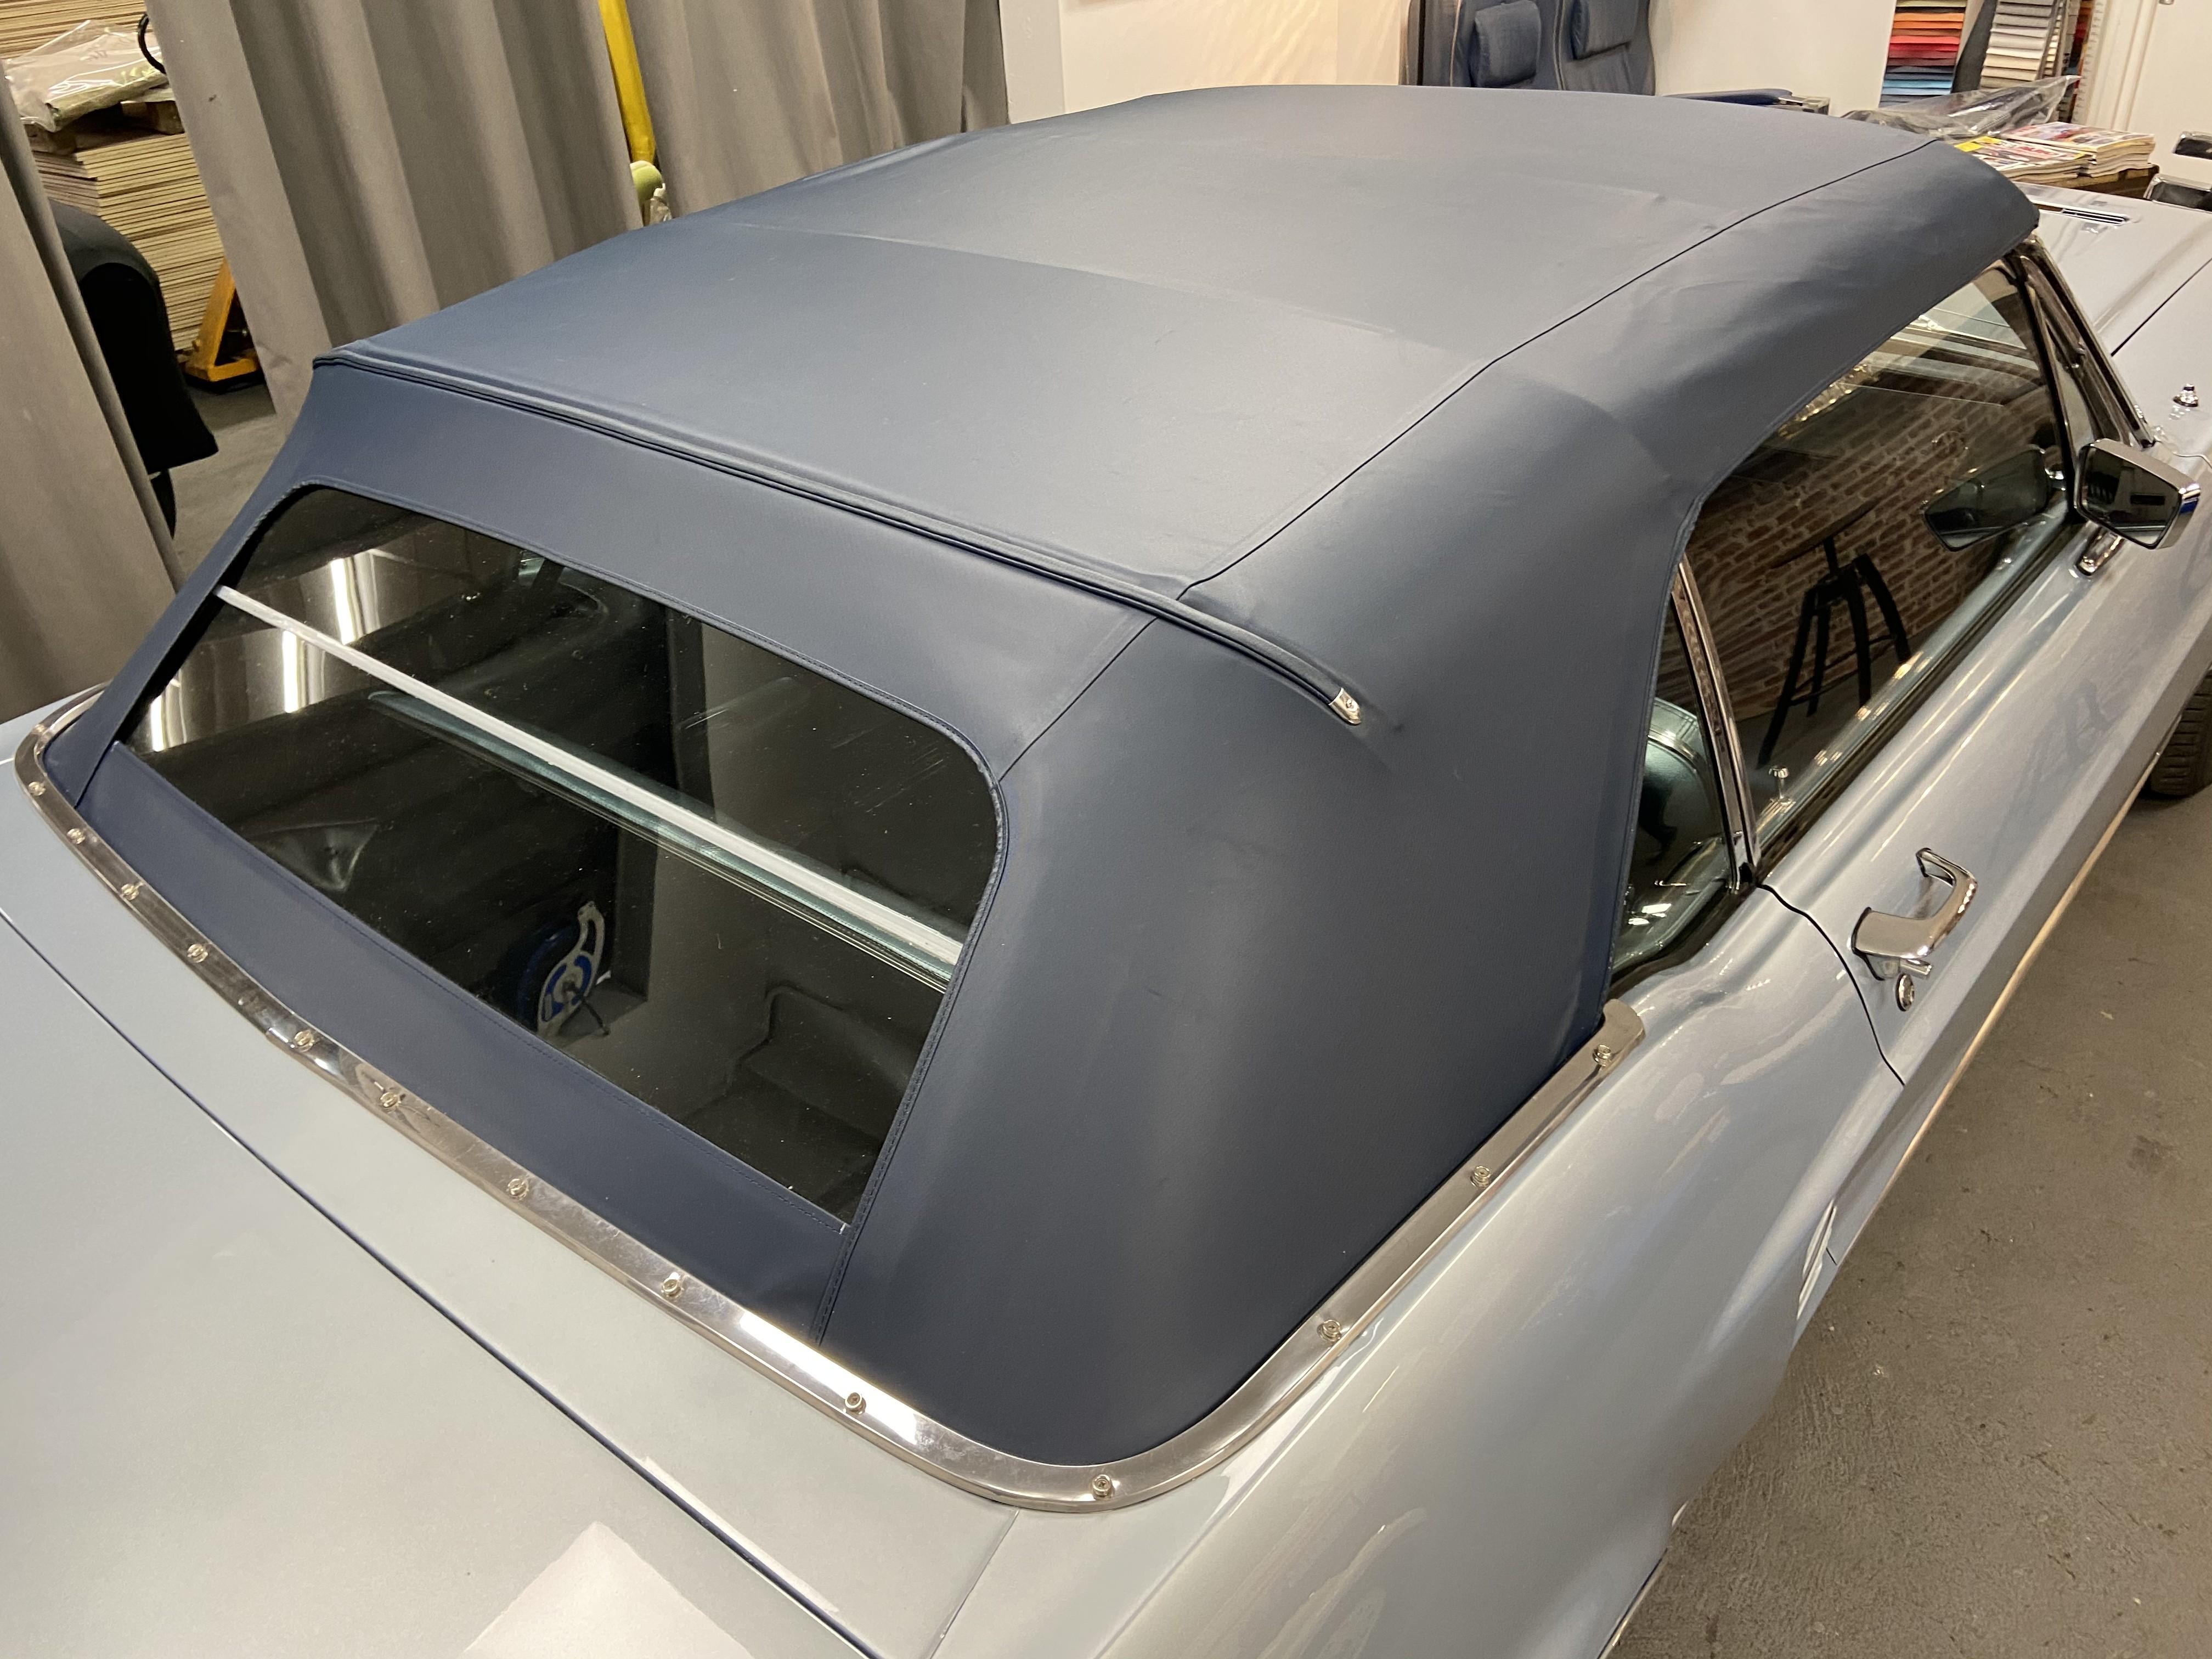 Changement de capote Ford mustang